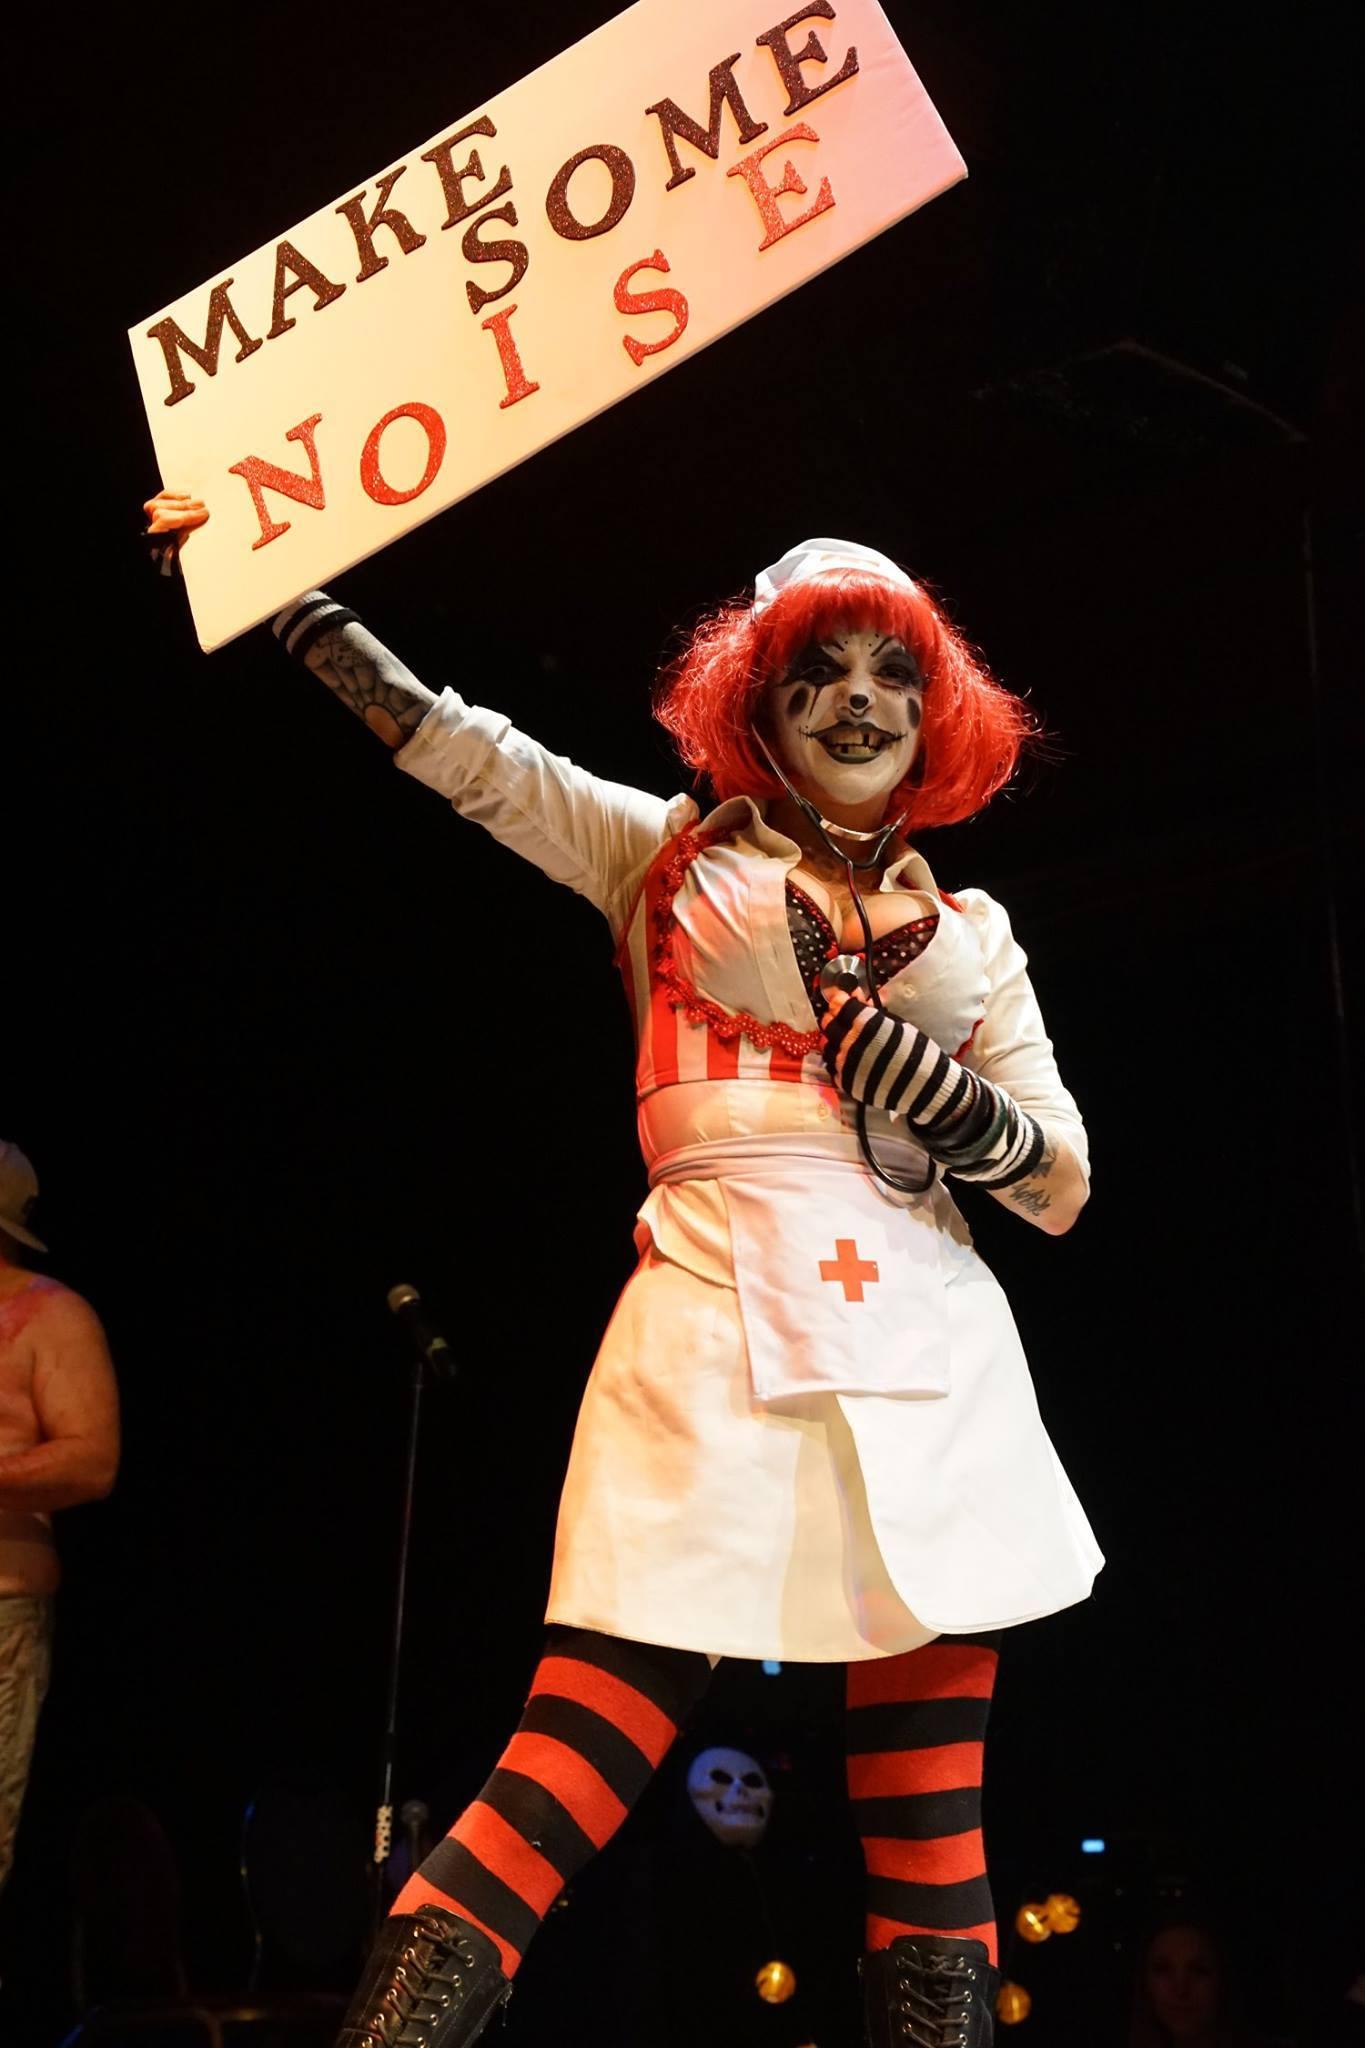 Scary Nurse.jpg